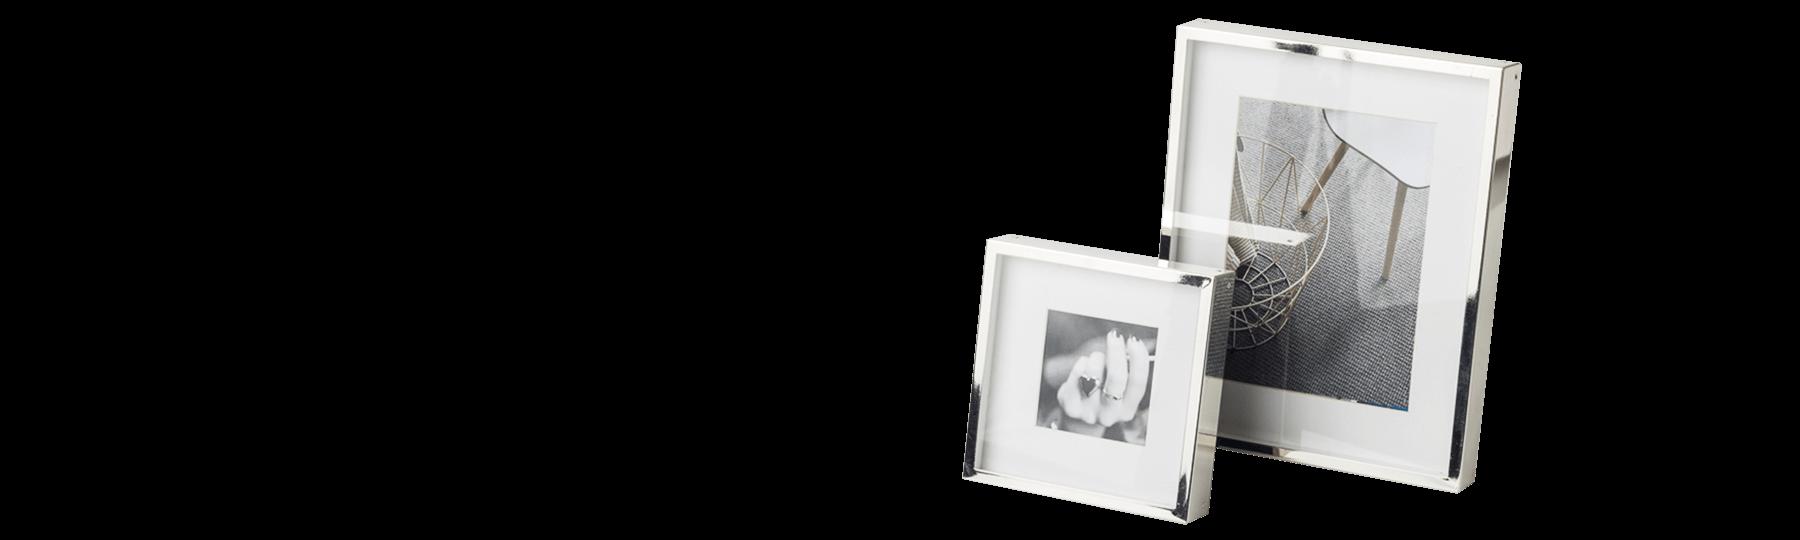 Frames & Photo Frames